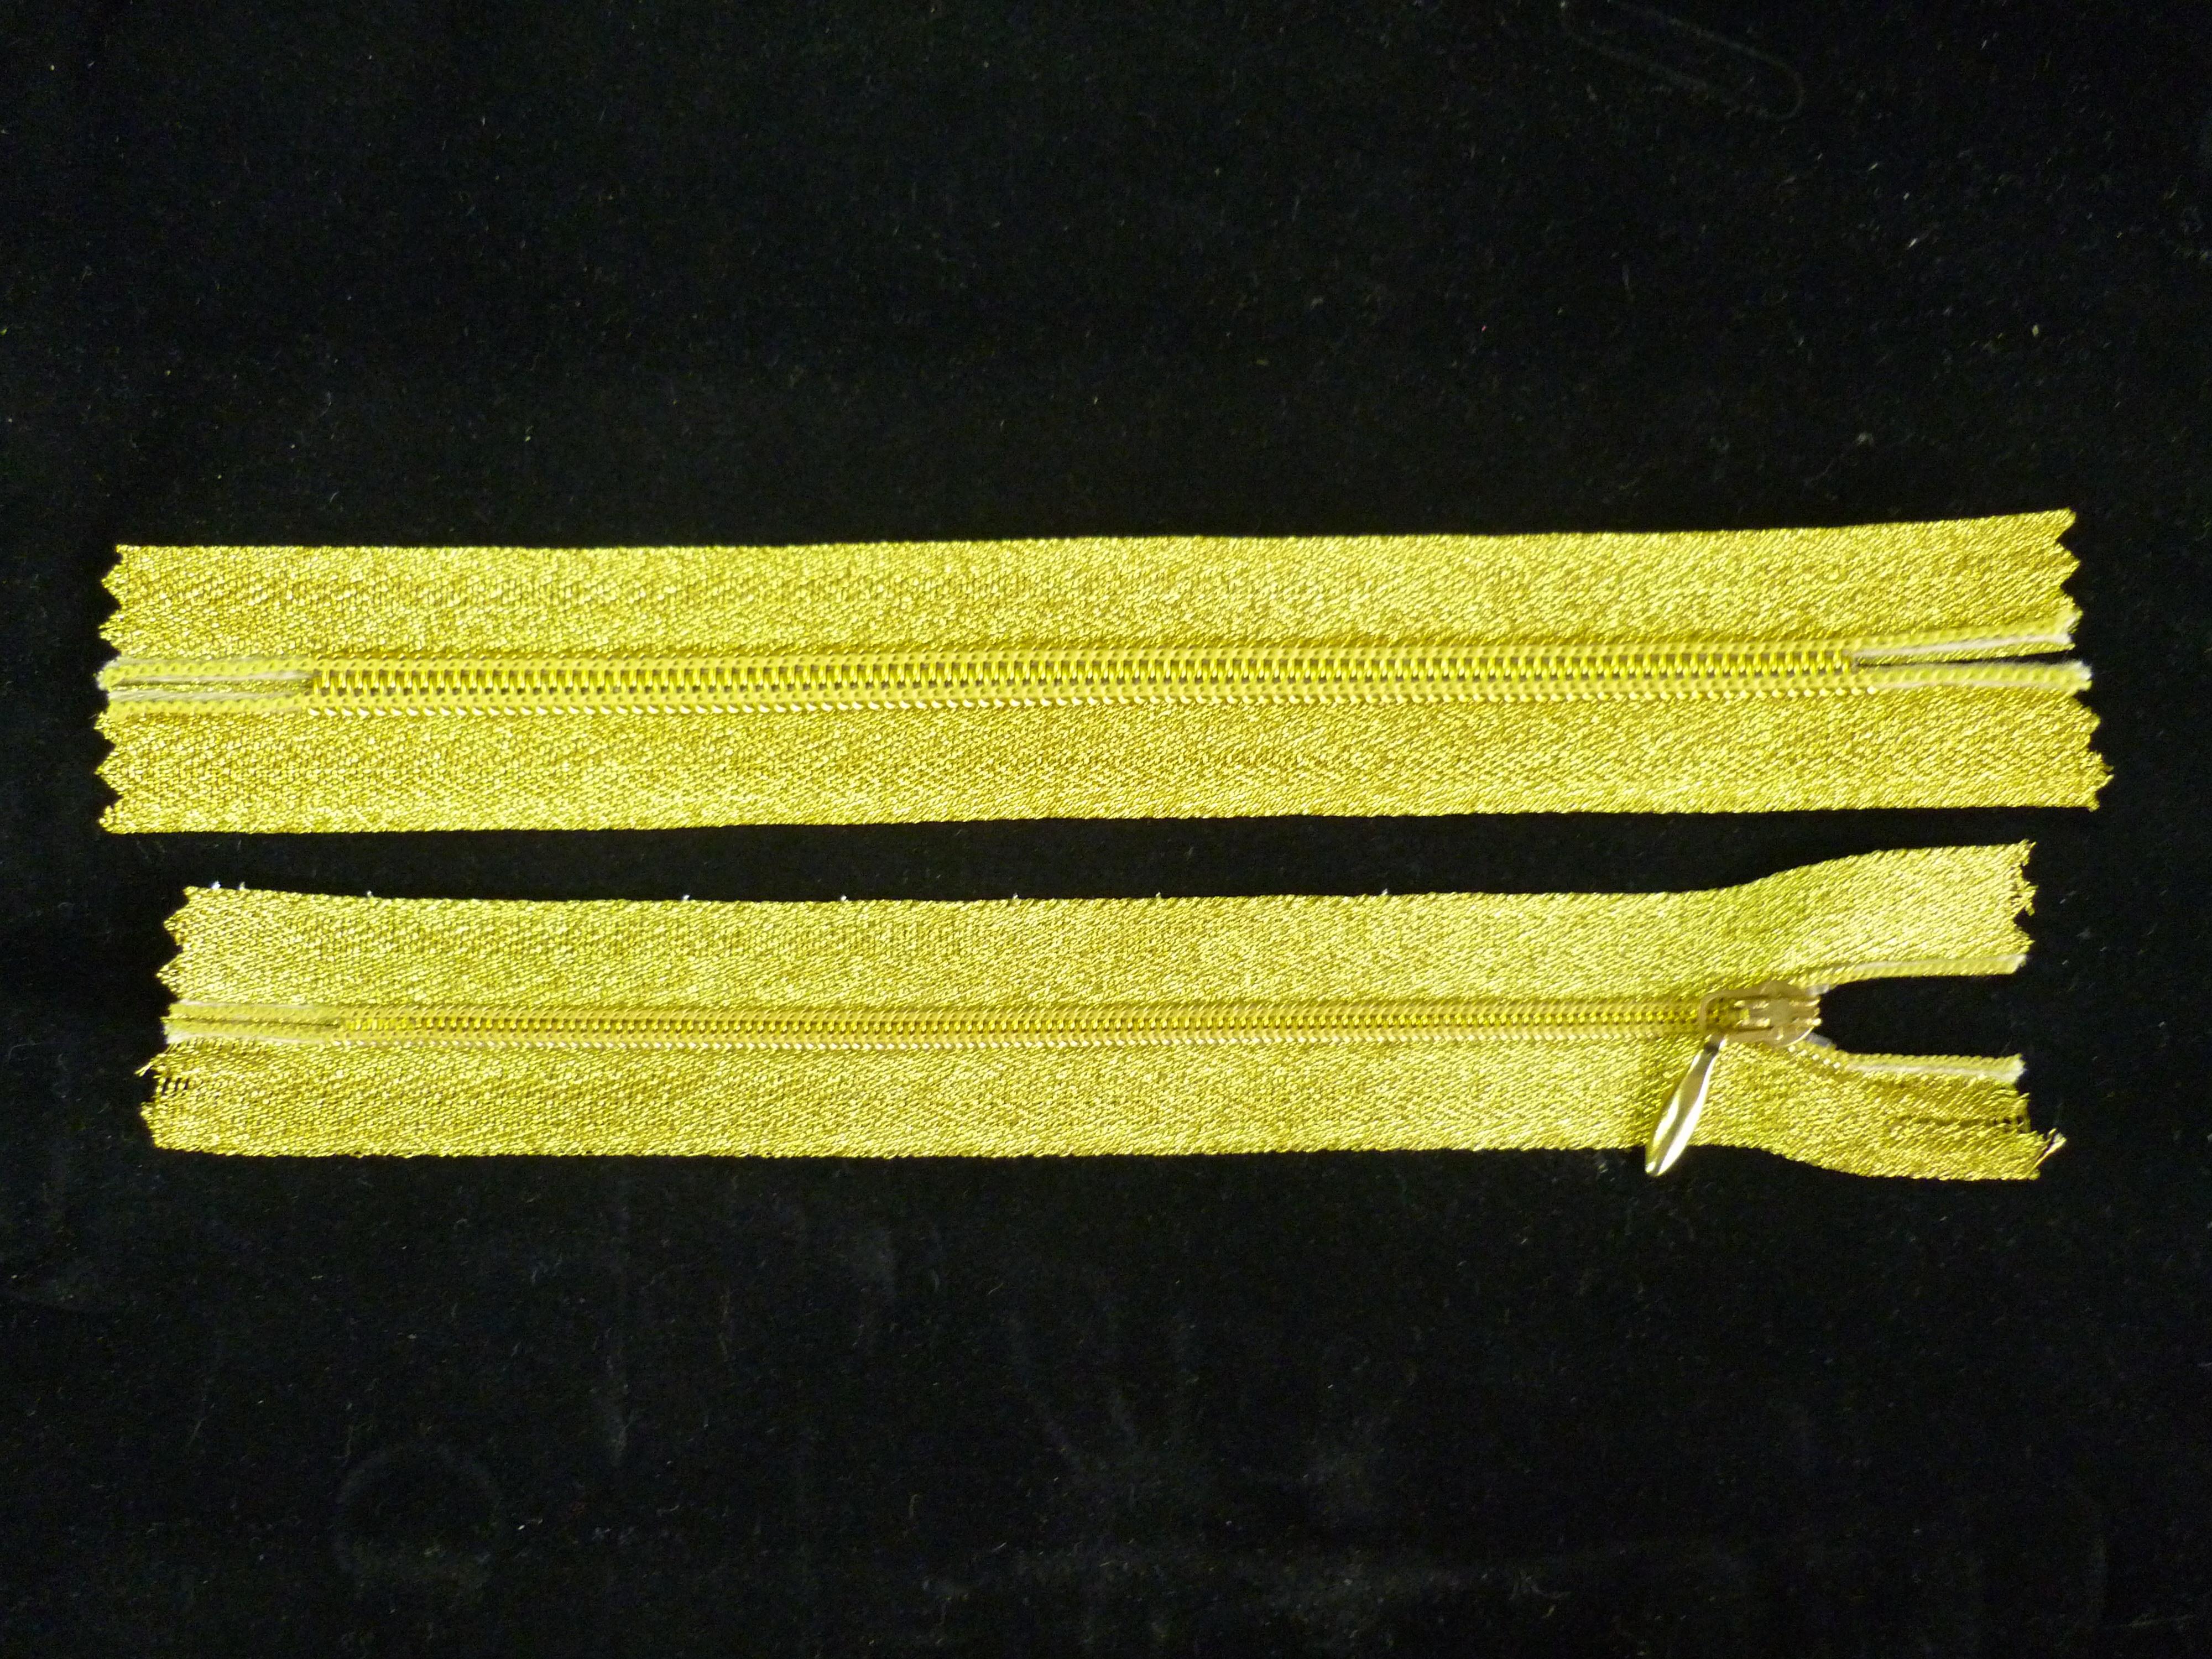 Декоративная спираль Тип 3 и Тип 5 Золото на золоте.JPG